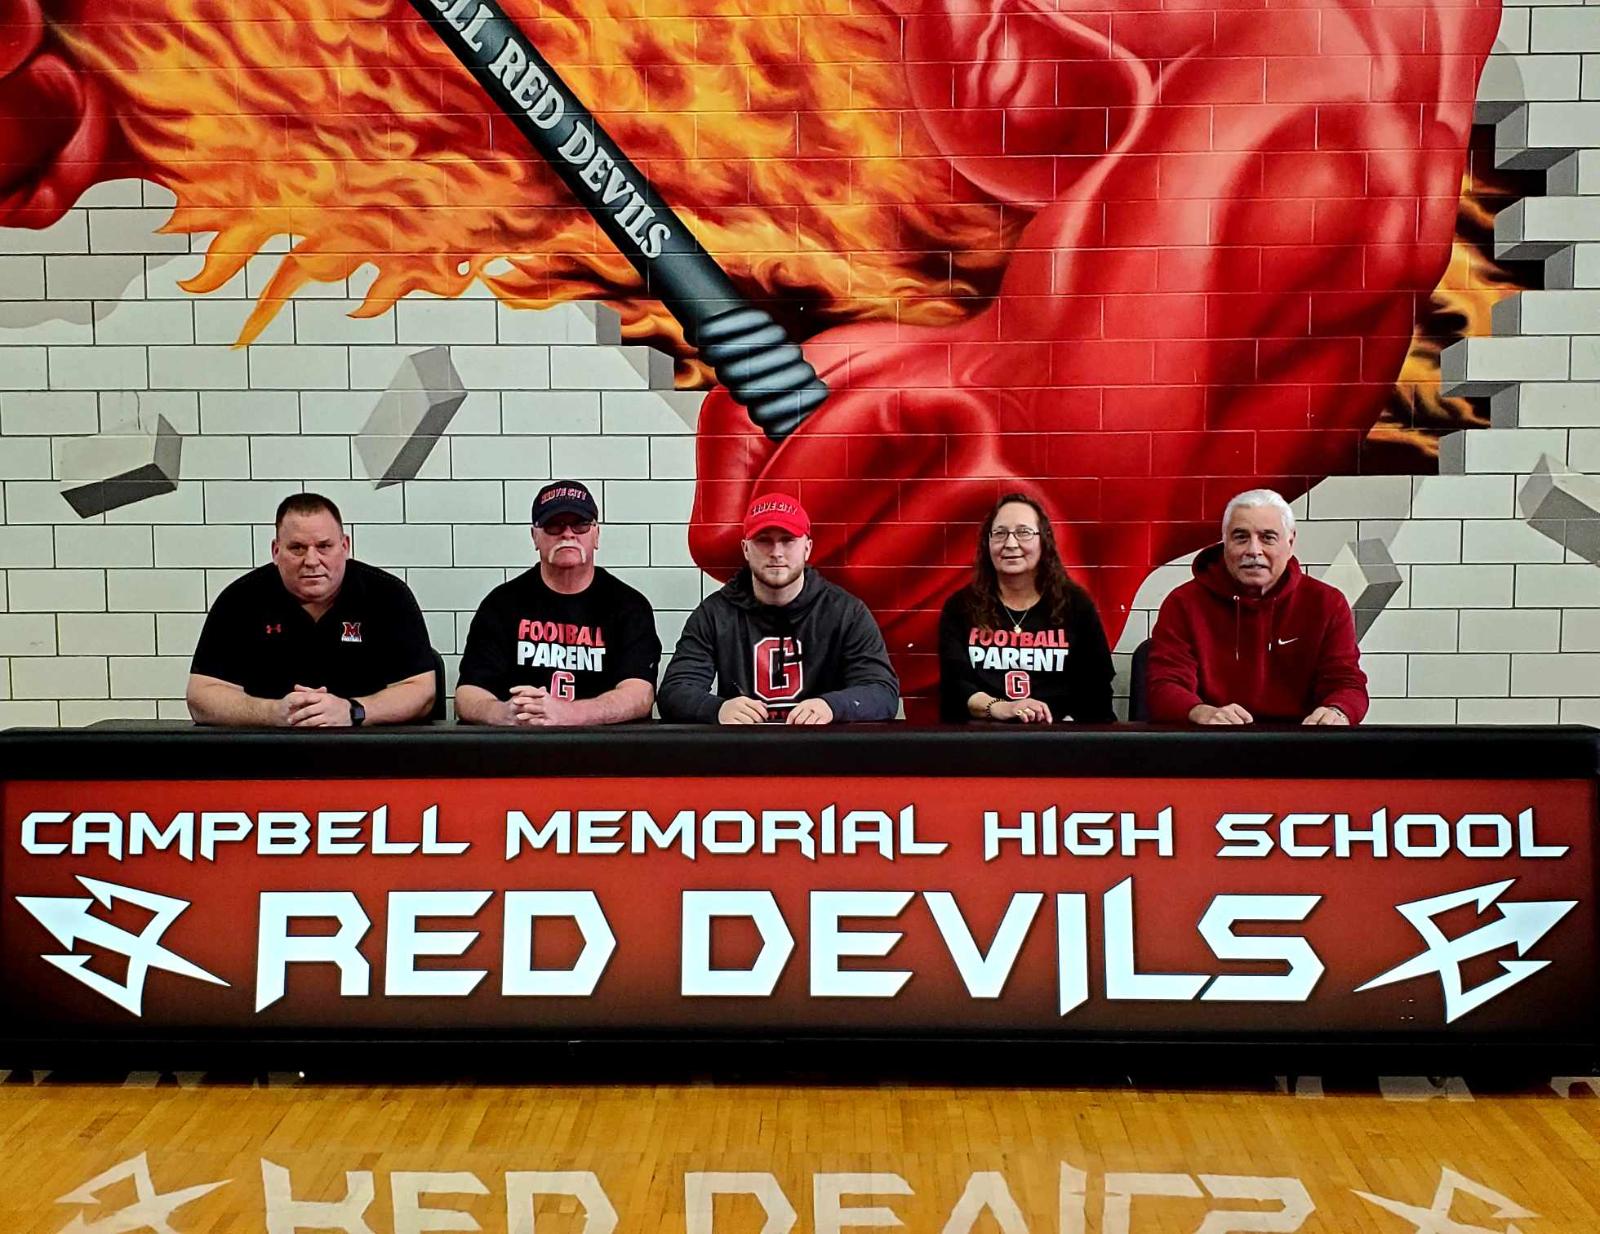 Campbell Memorial High School Senior James Shaffer to Attend Grove City College